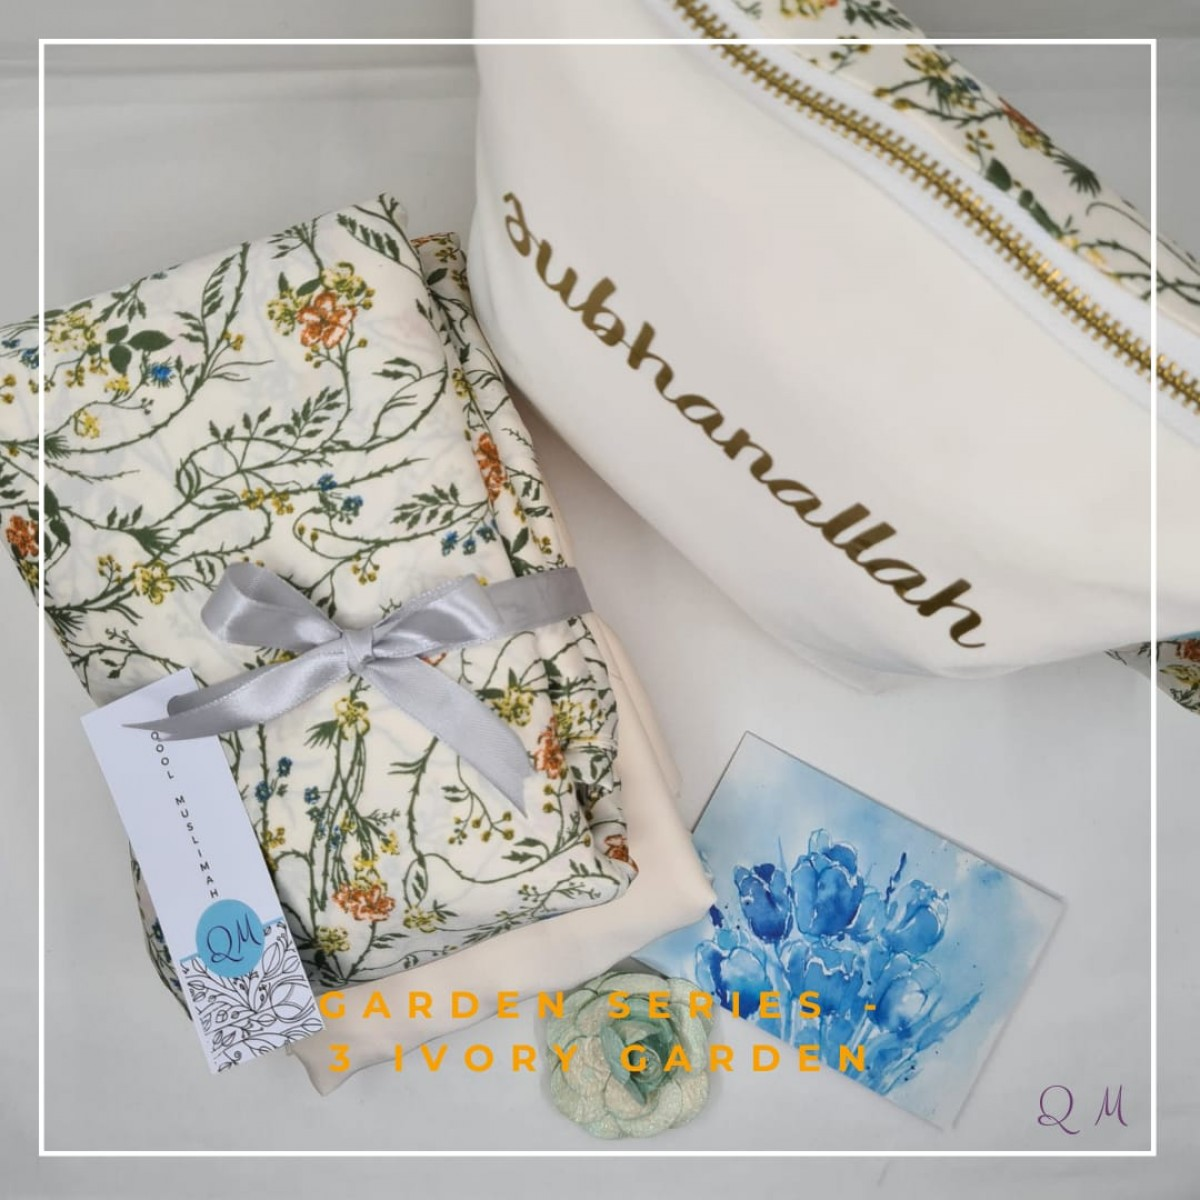 P5. Telekung/Mukena Armani Silk Garden Series - Ivory Garden - Qool Muslimah